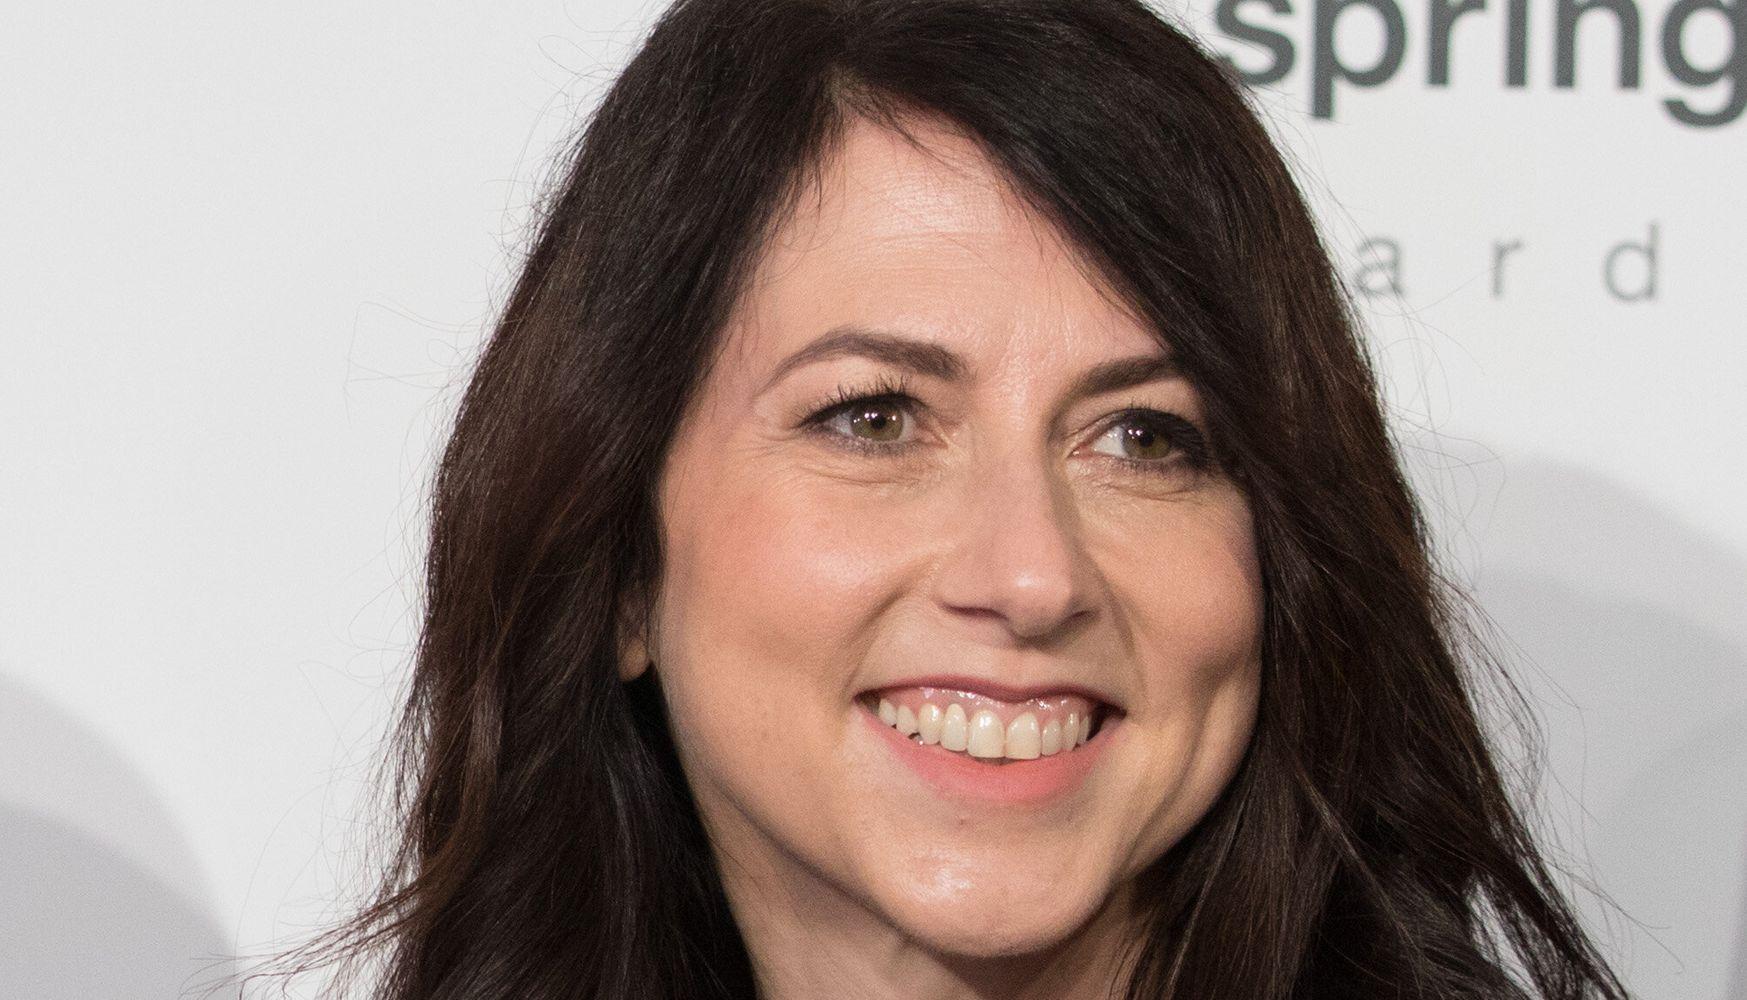 MacKenzie Scott Has Donated $1.7 Billion Since Divorce From Jeff Bezos